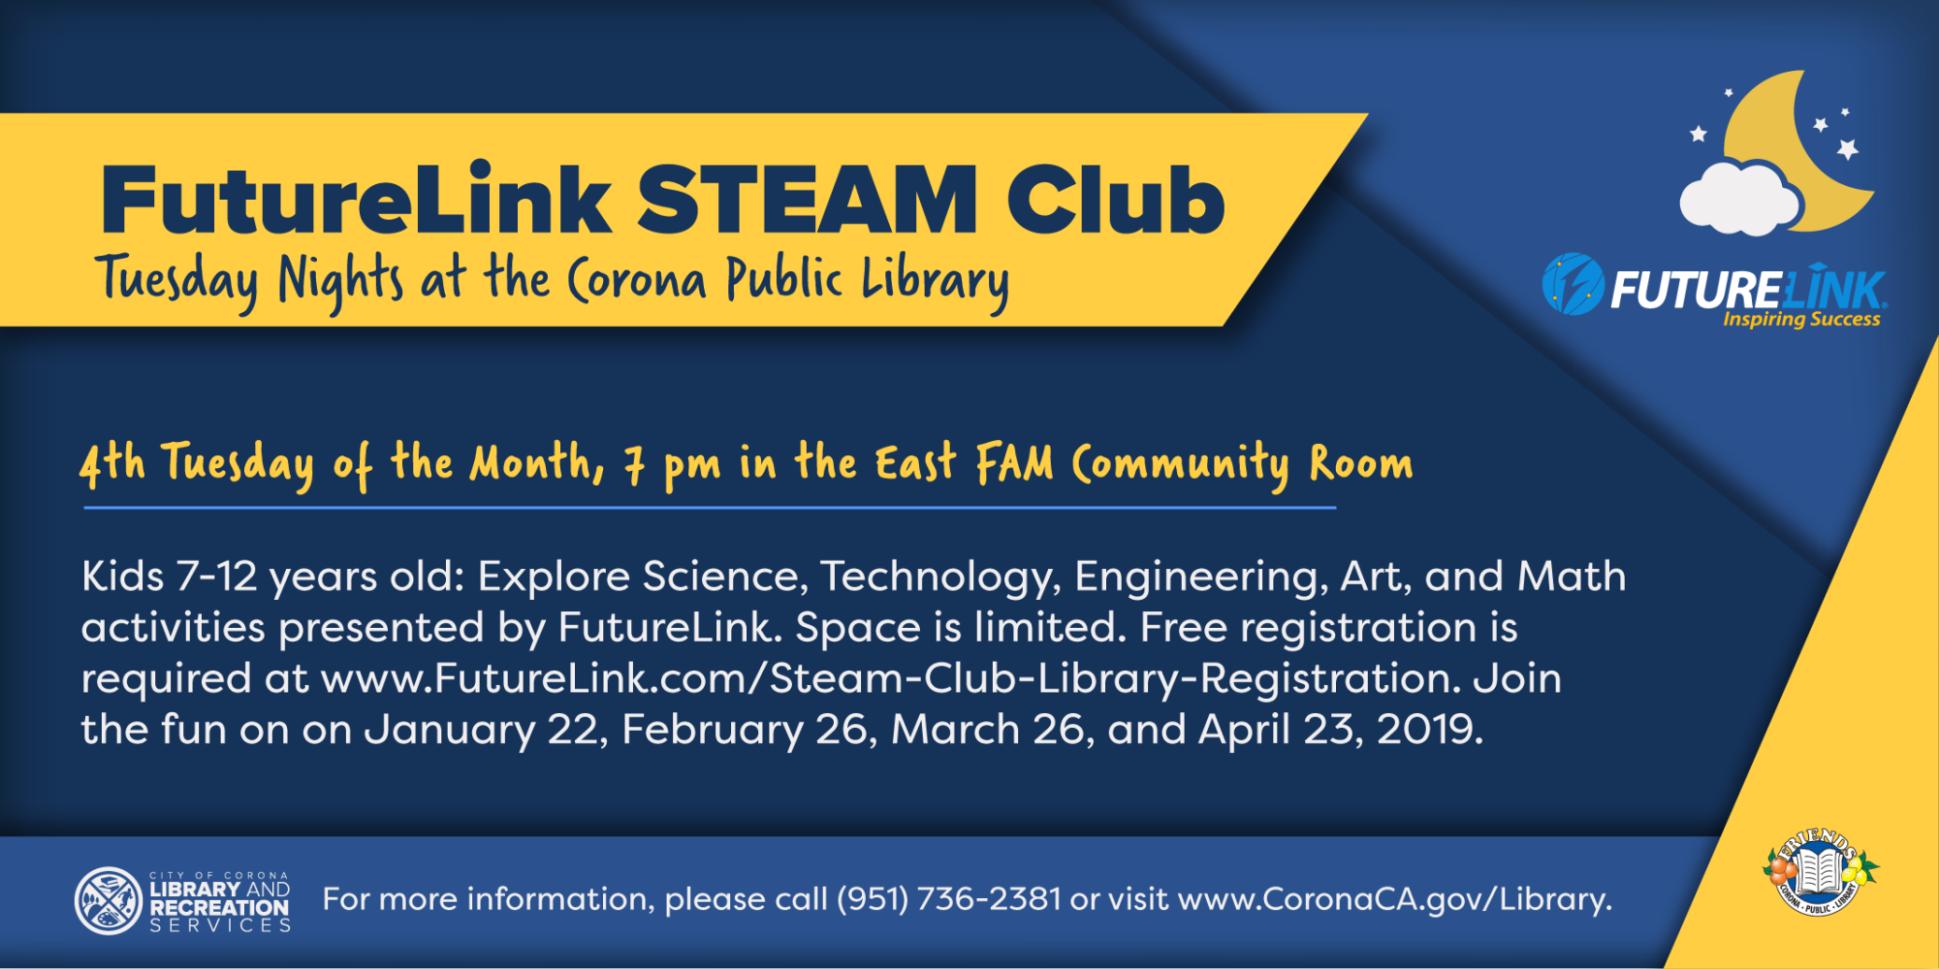 FutureLink STEAM Club | LaRS on the Go | City of Corona